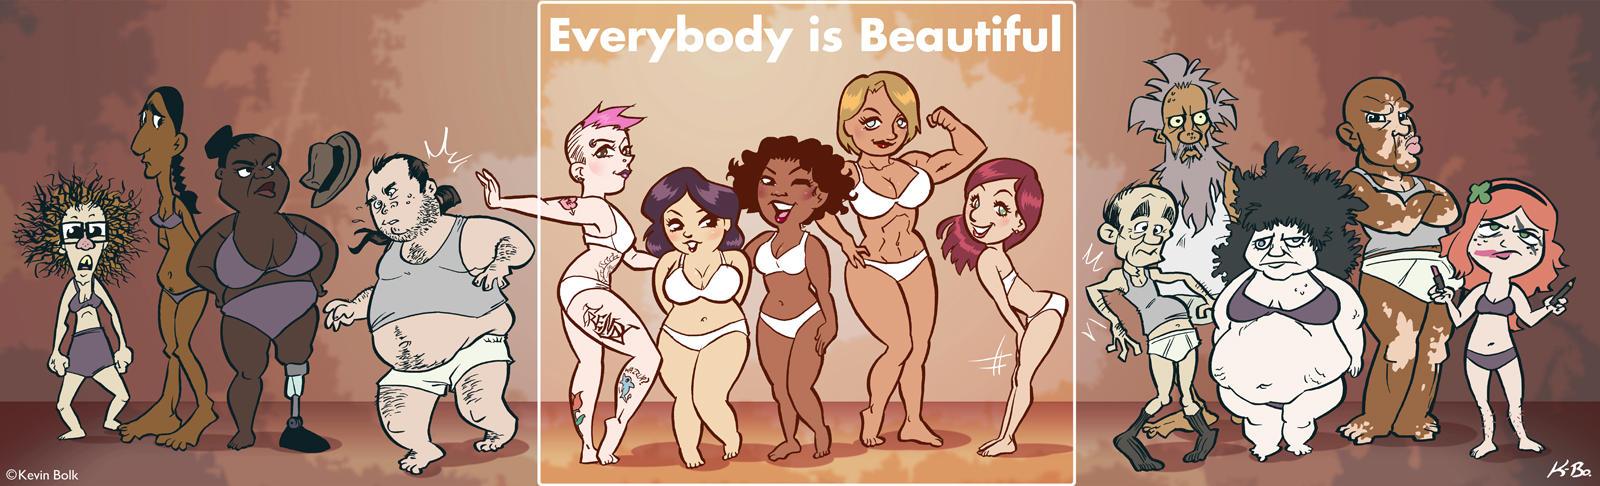 Everybody* Is Beautiful by kevinbolk